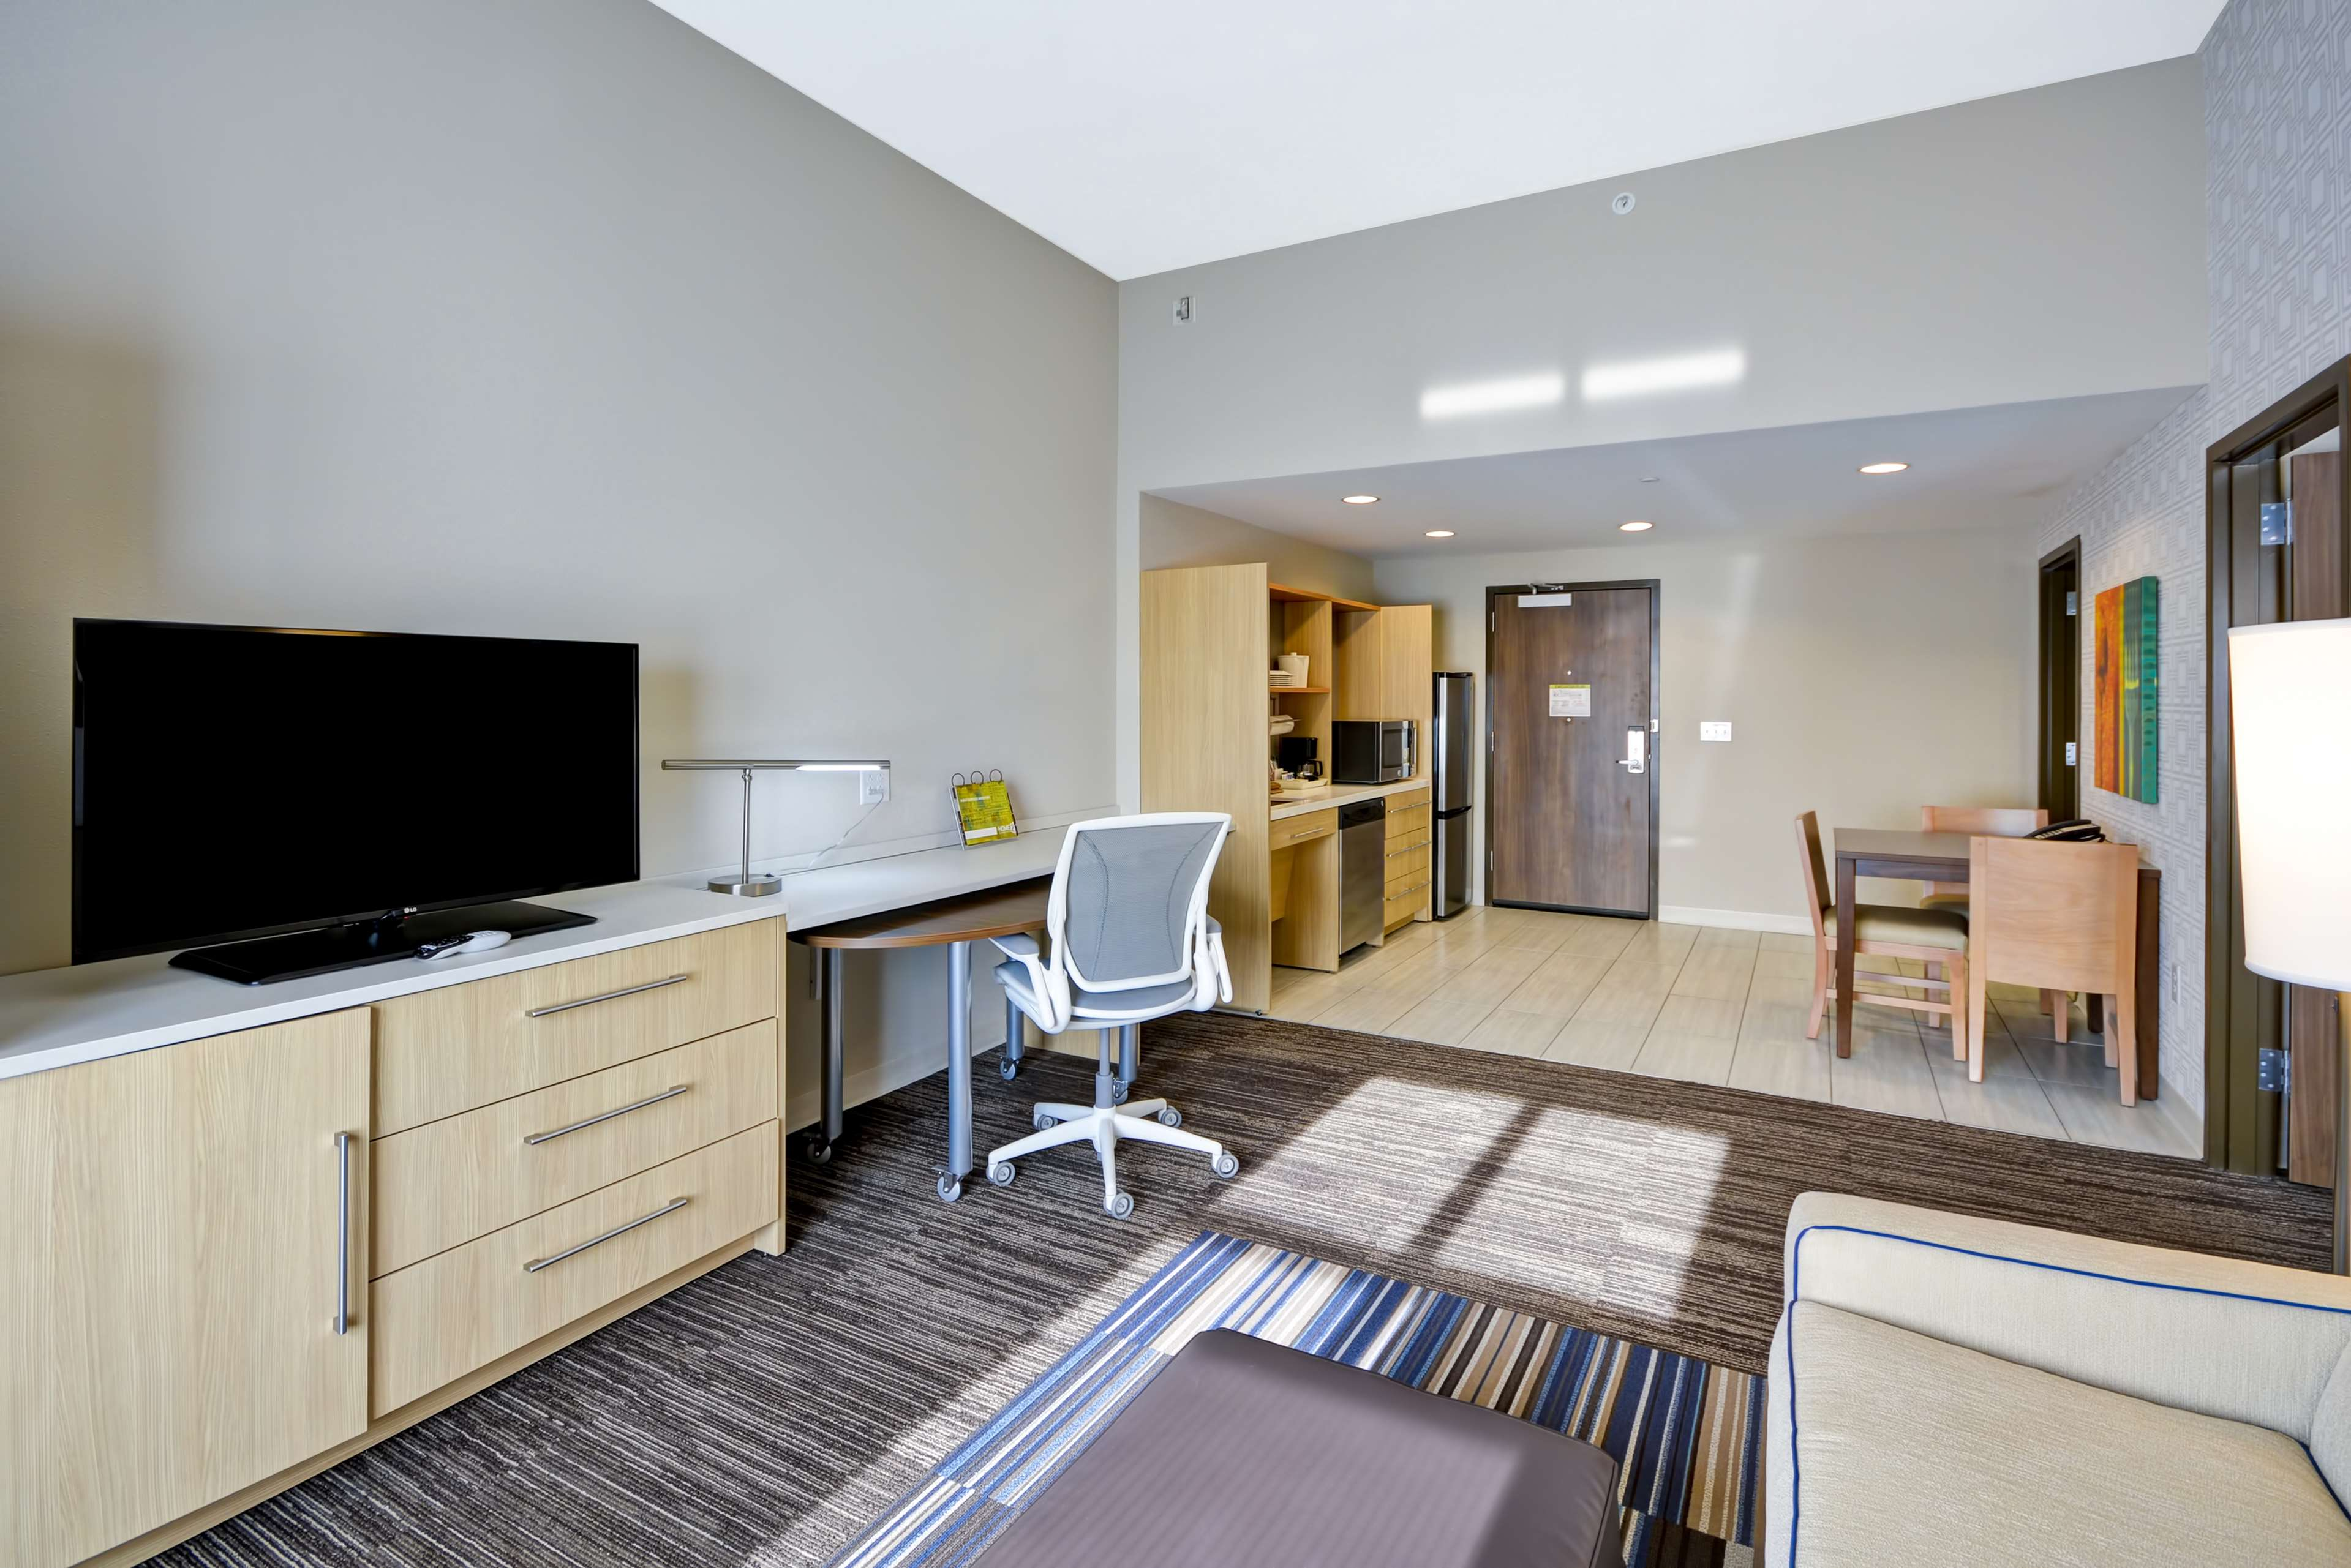 Home2 Suites by Hilton  St. Simons Island image 41